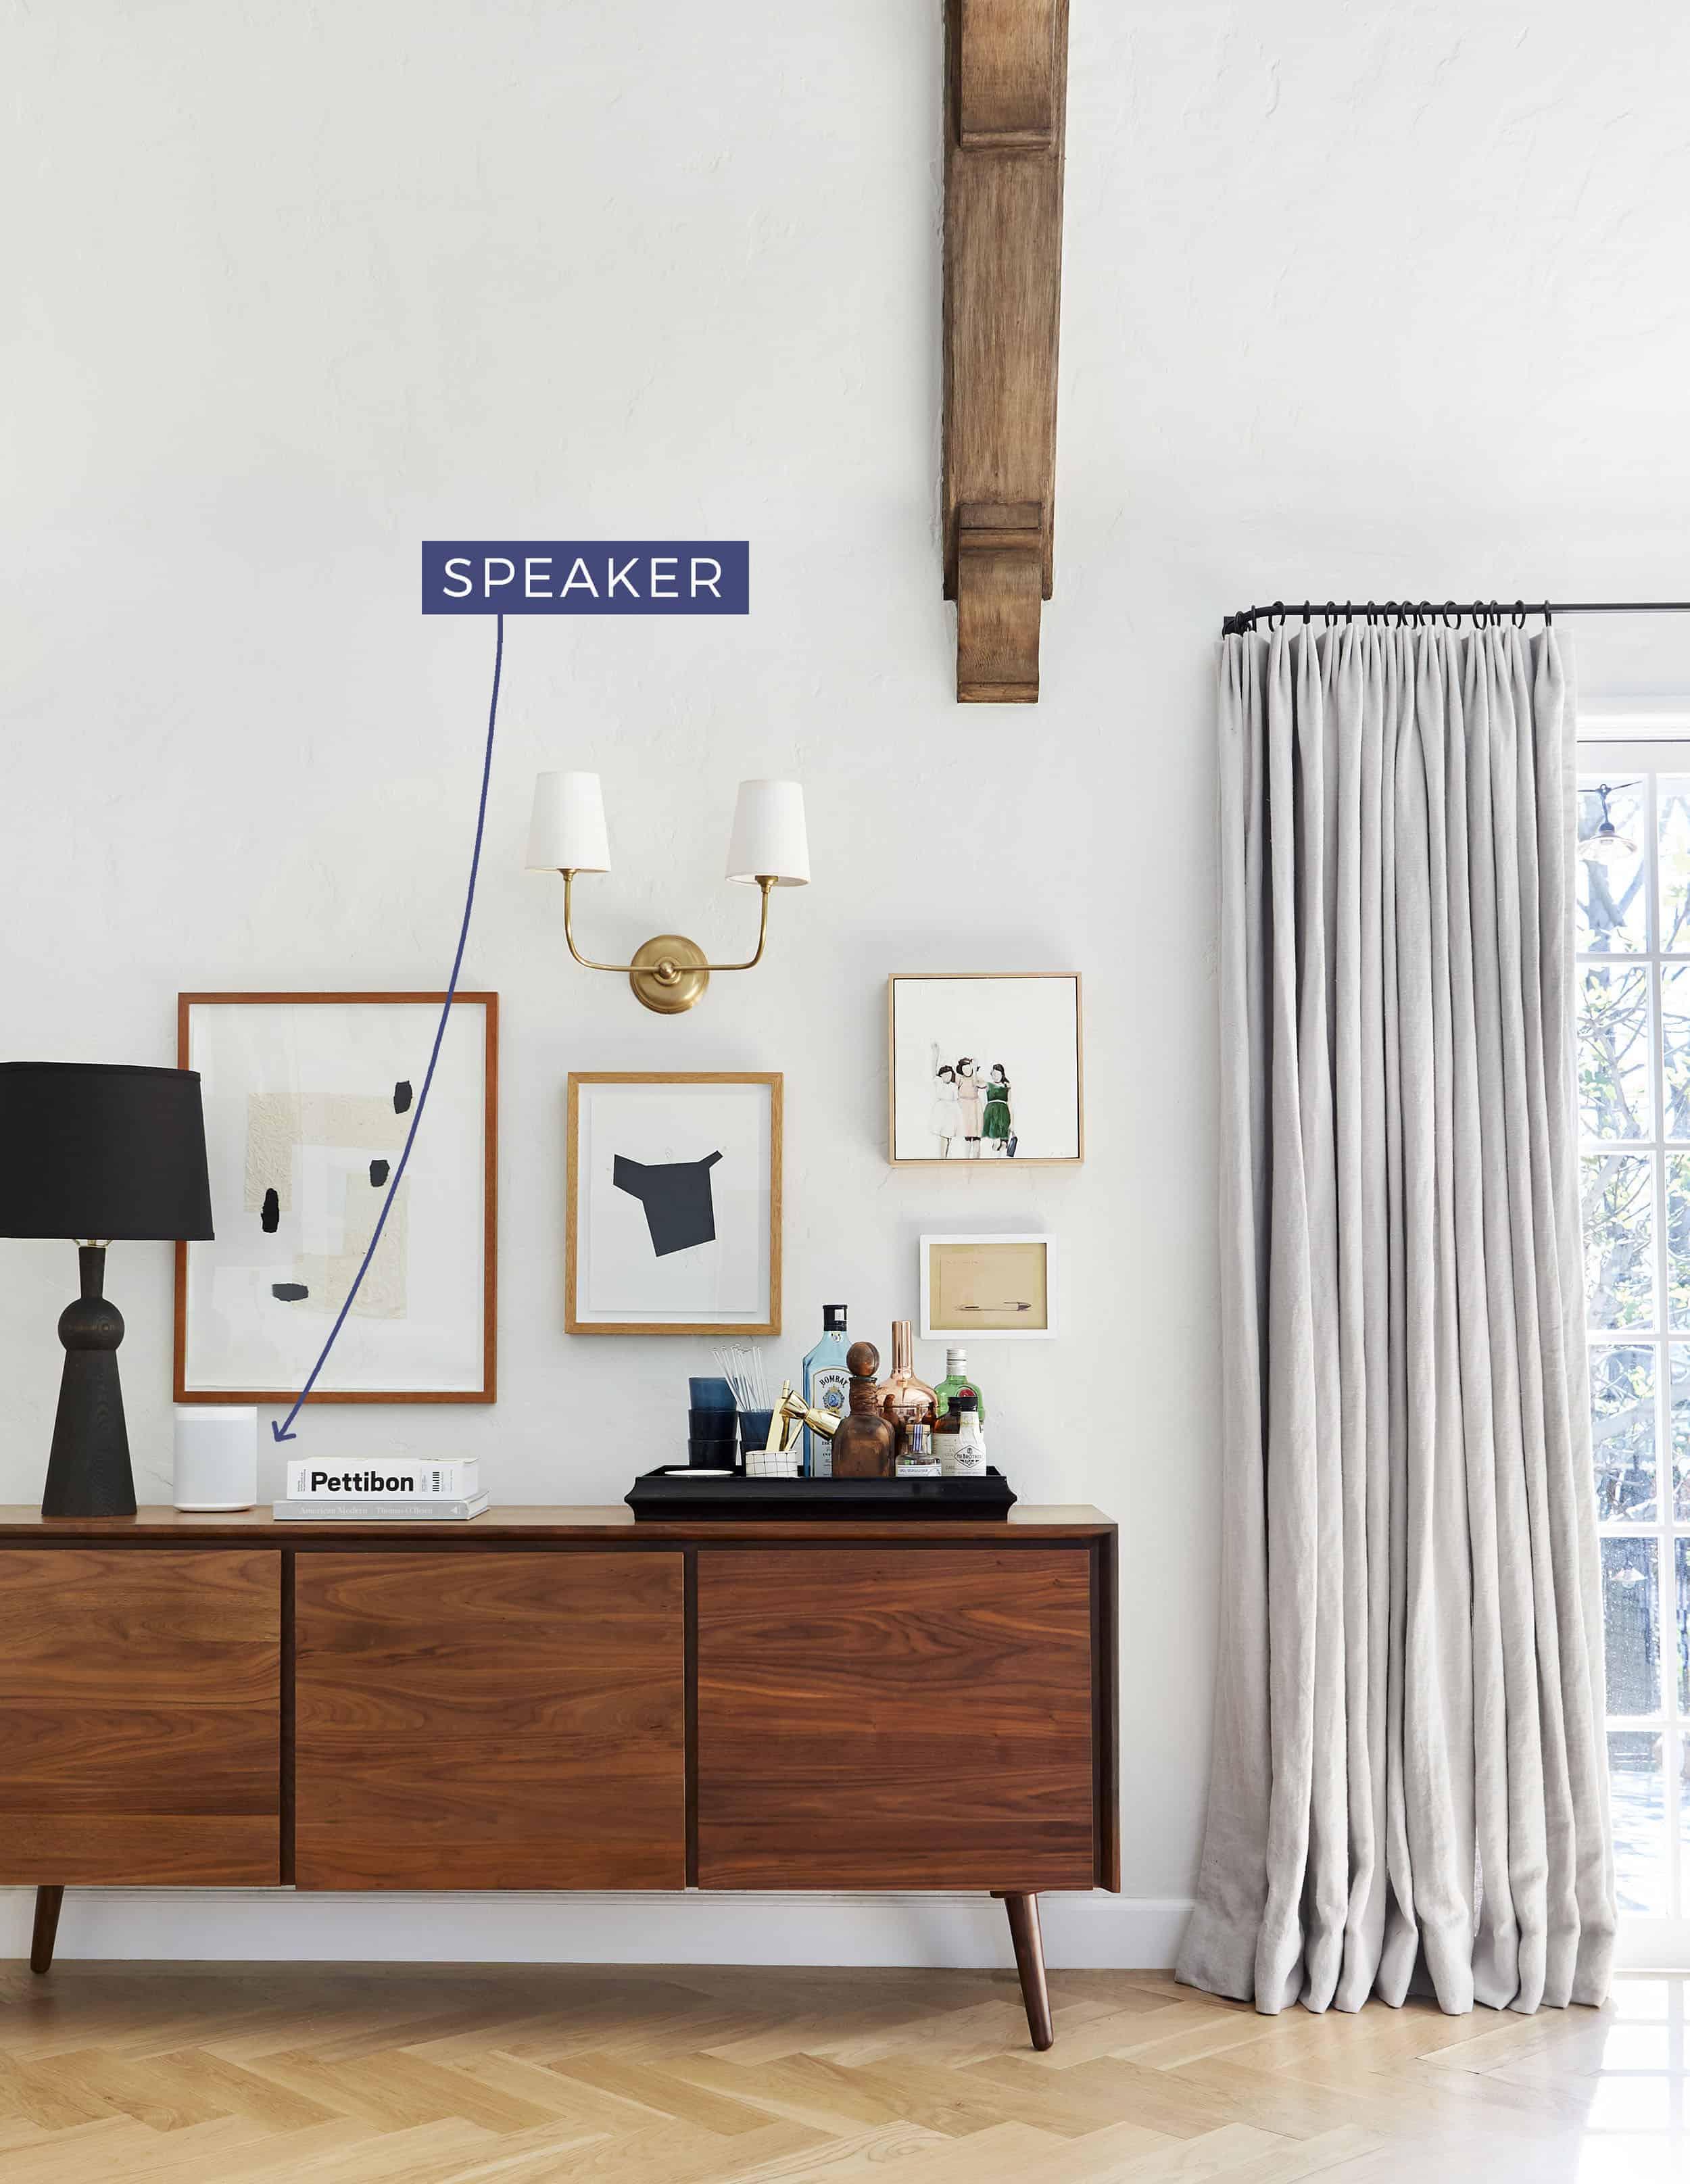 Sonos Speaker For Home Projector